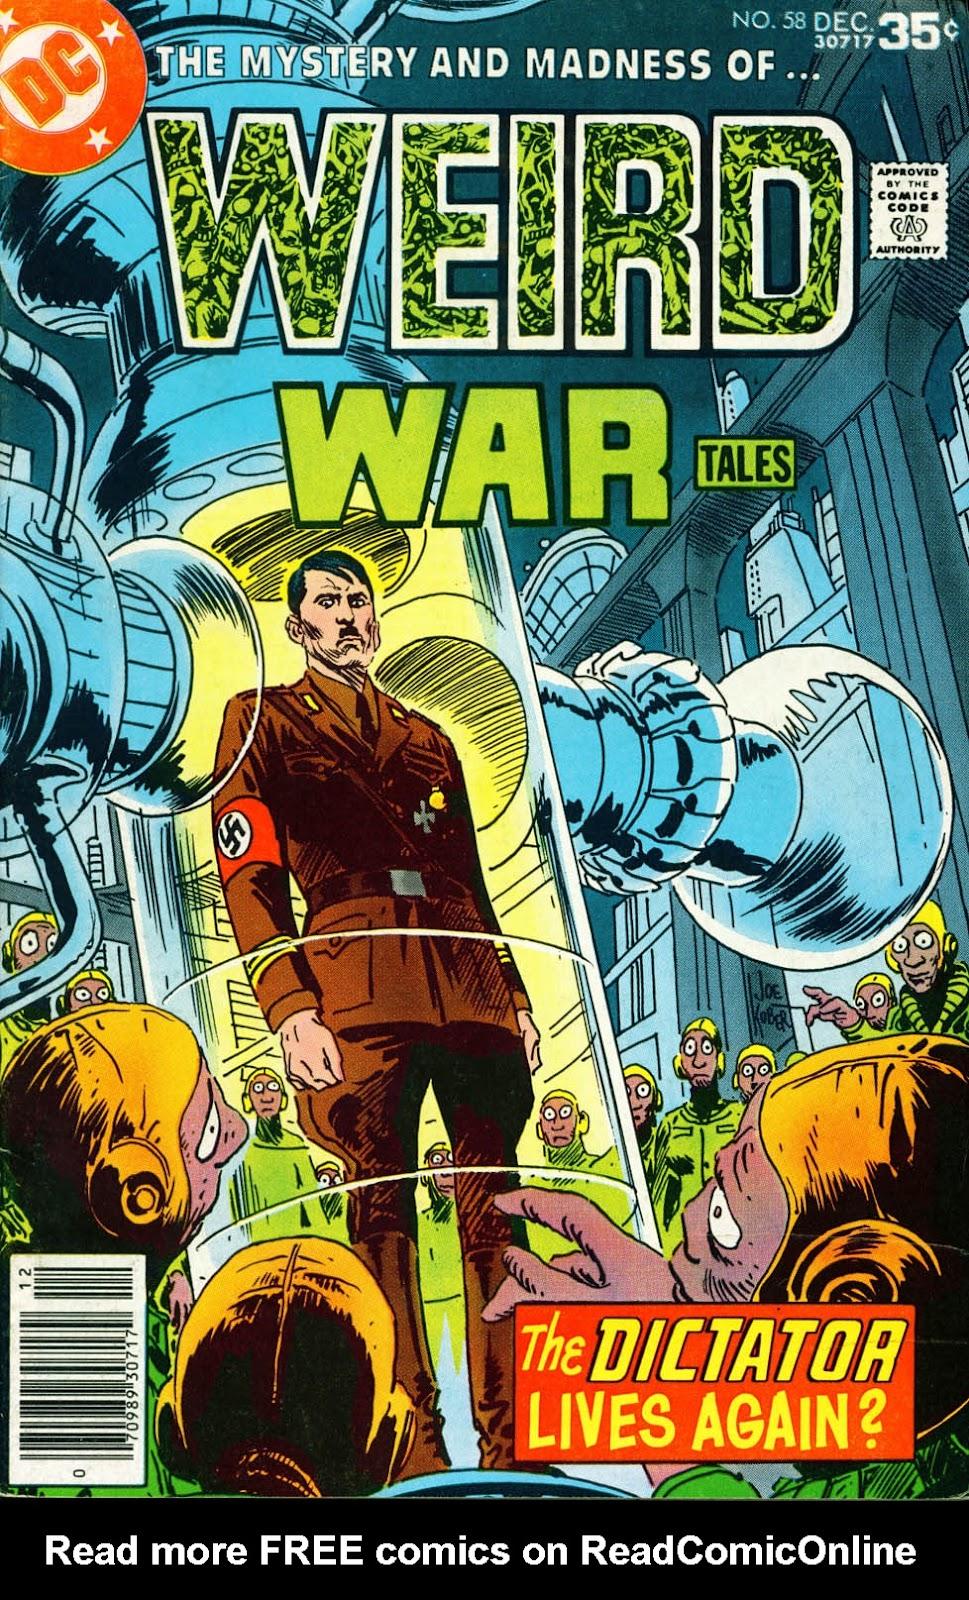 Weird War Tales (1971) issue 58 - Page 1